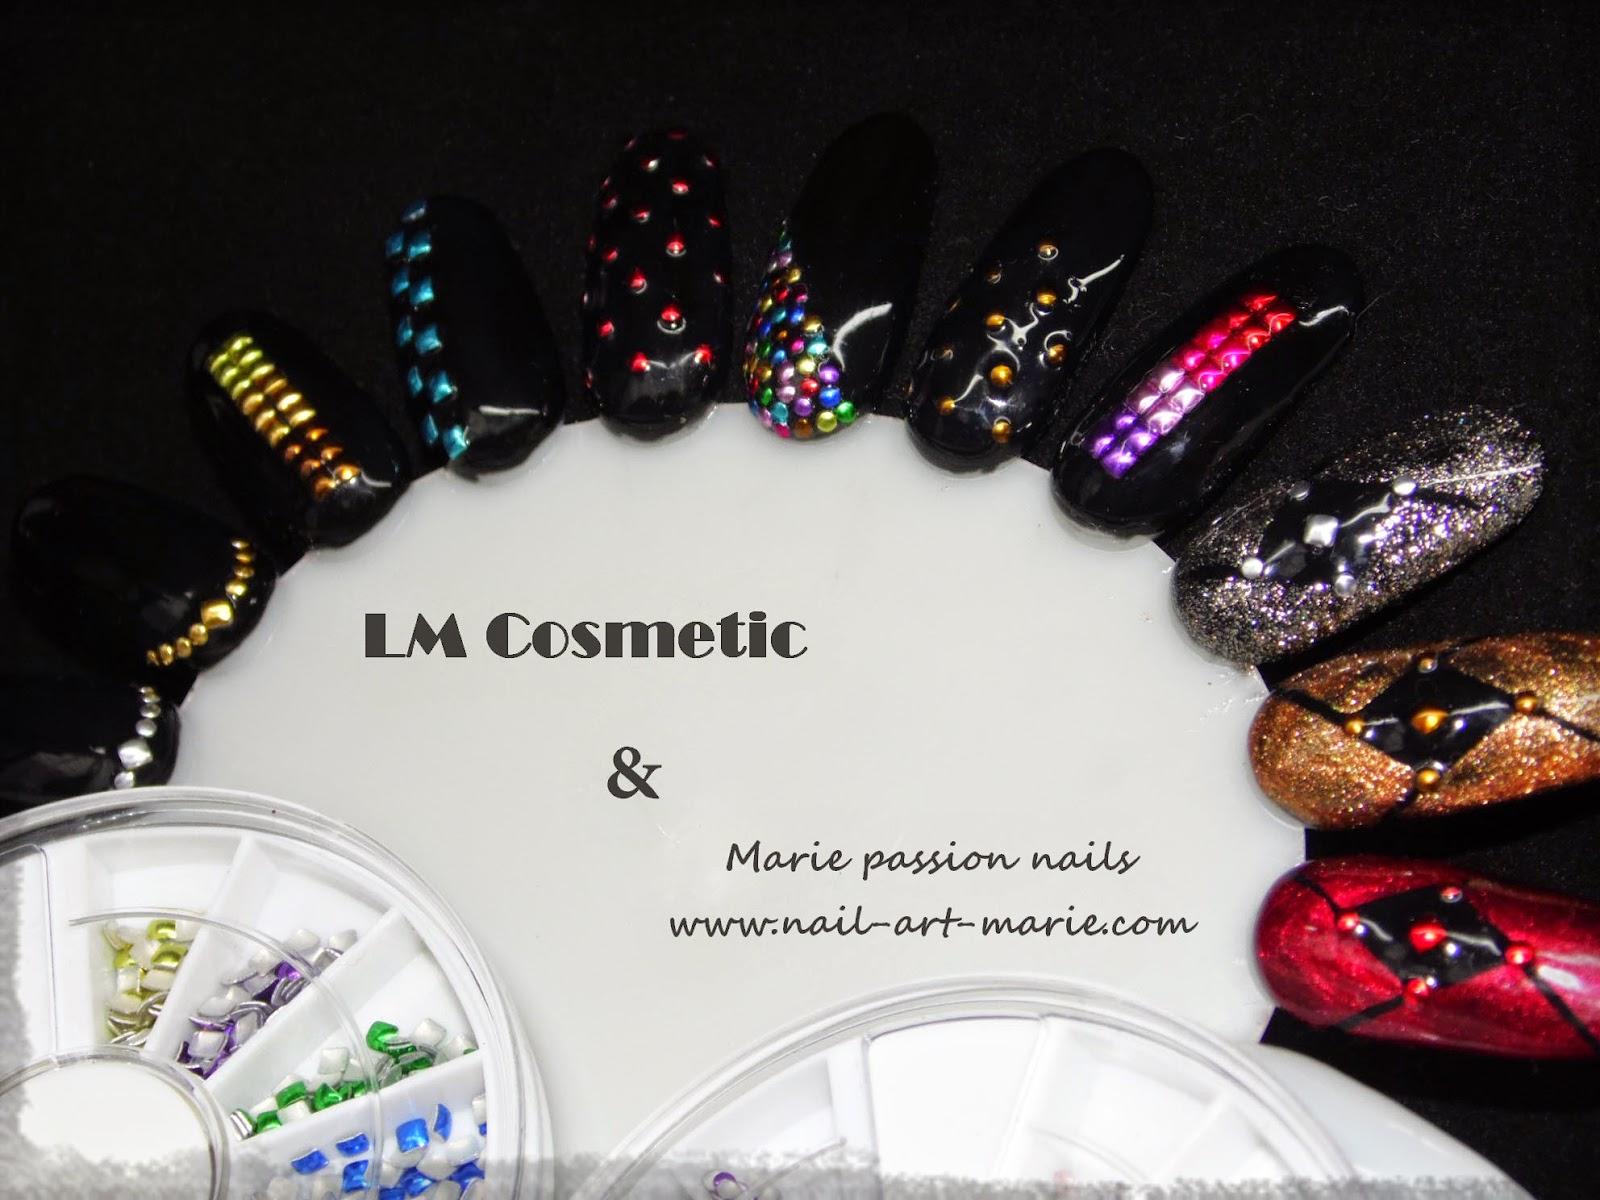 Nail Art studs métalliques Lm Cosmetic